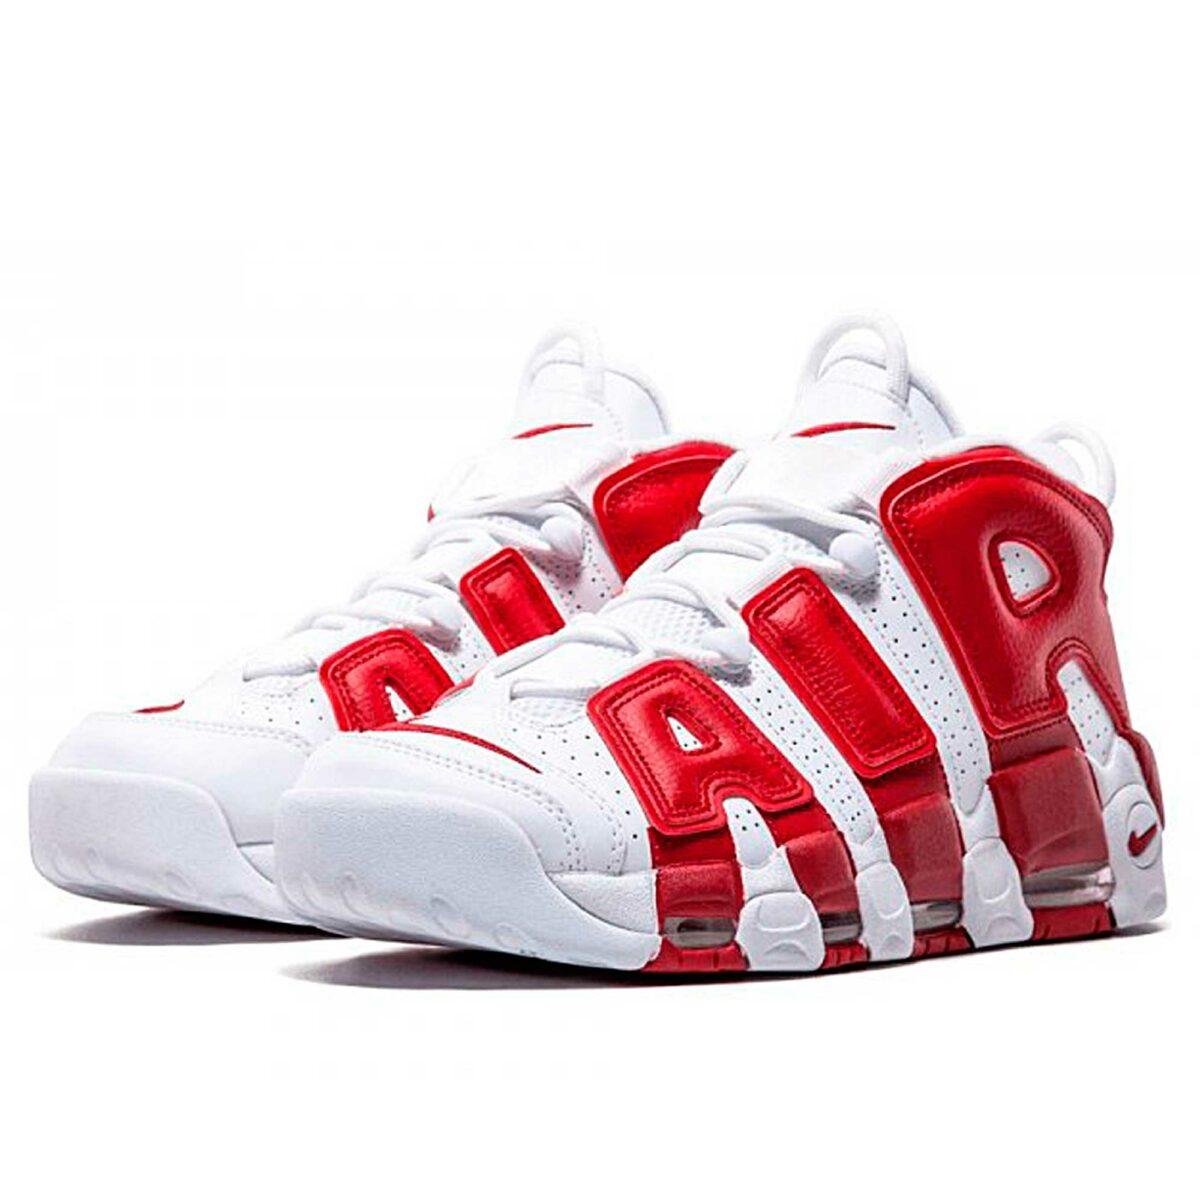 nike air more uptempo white gym red 414962-100 купить